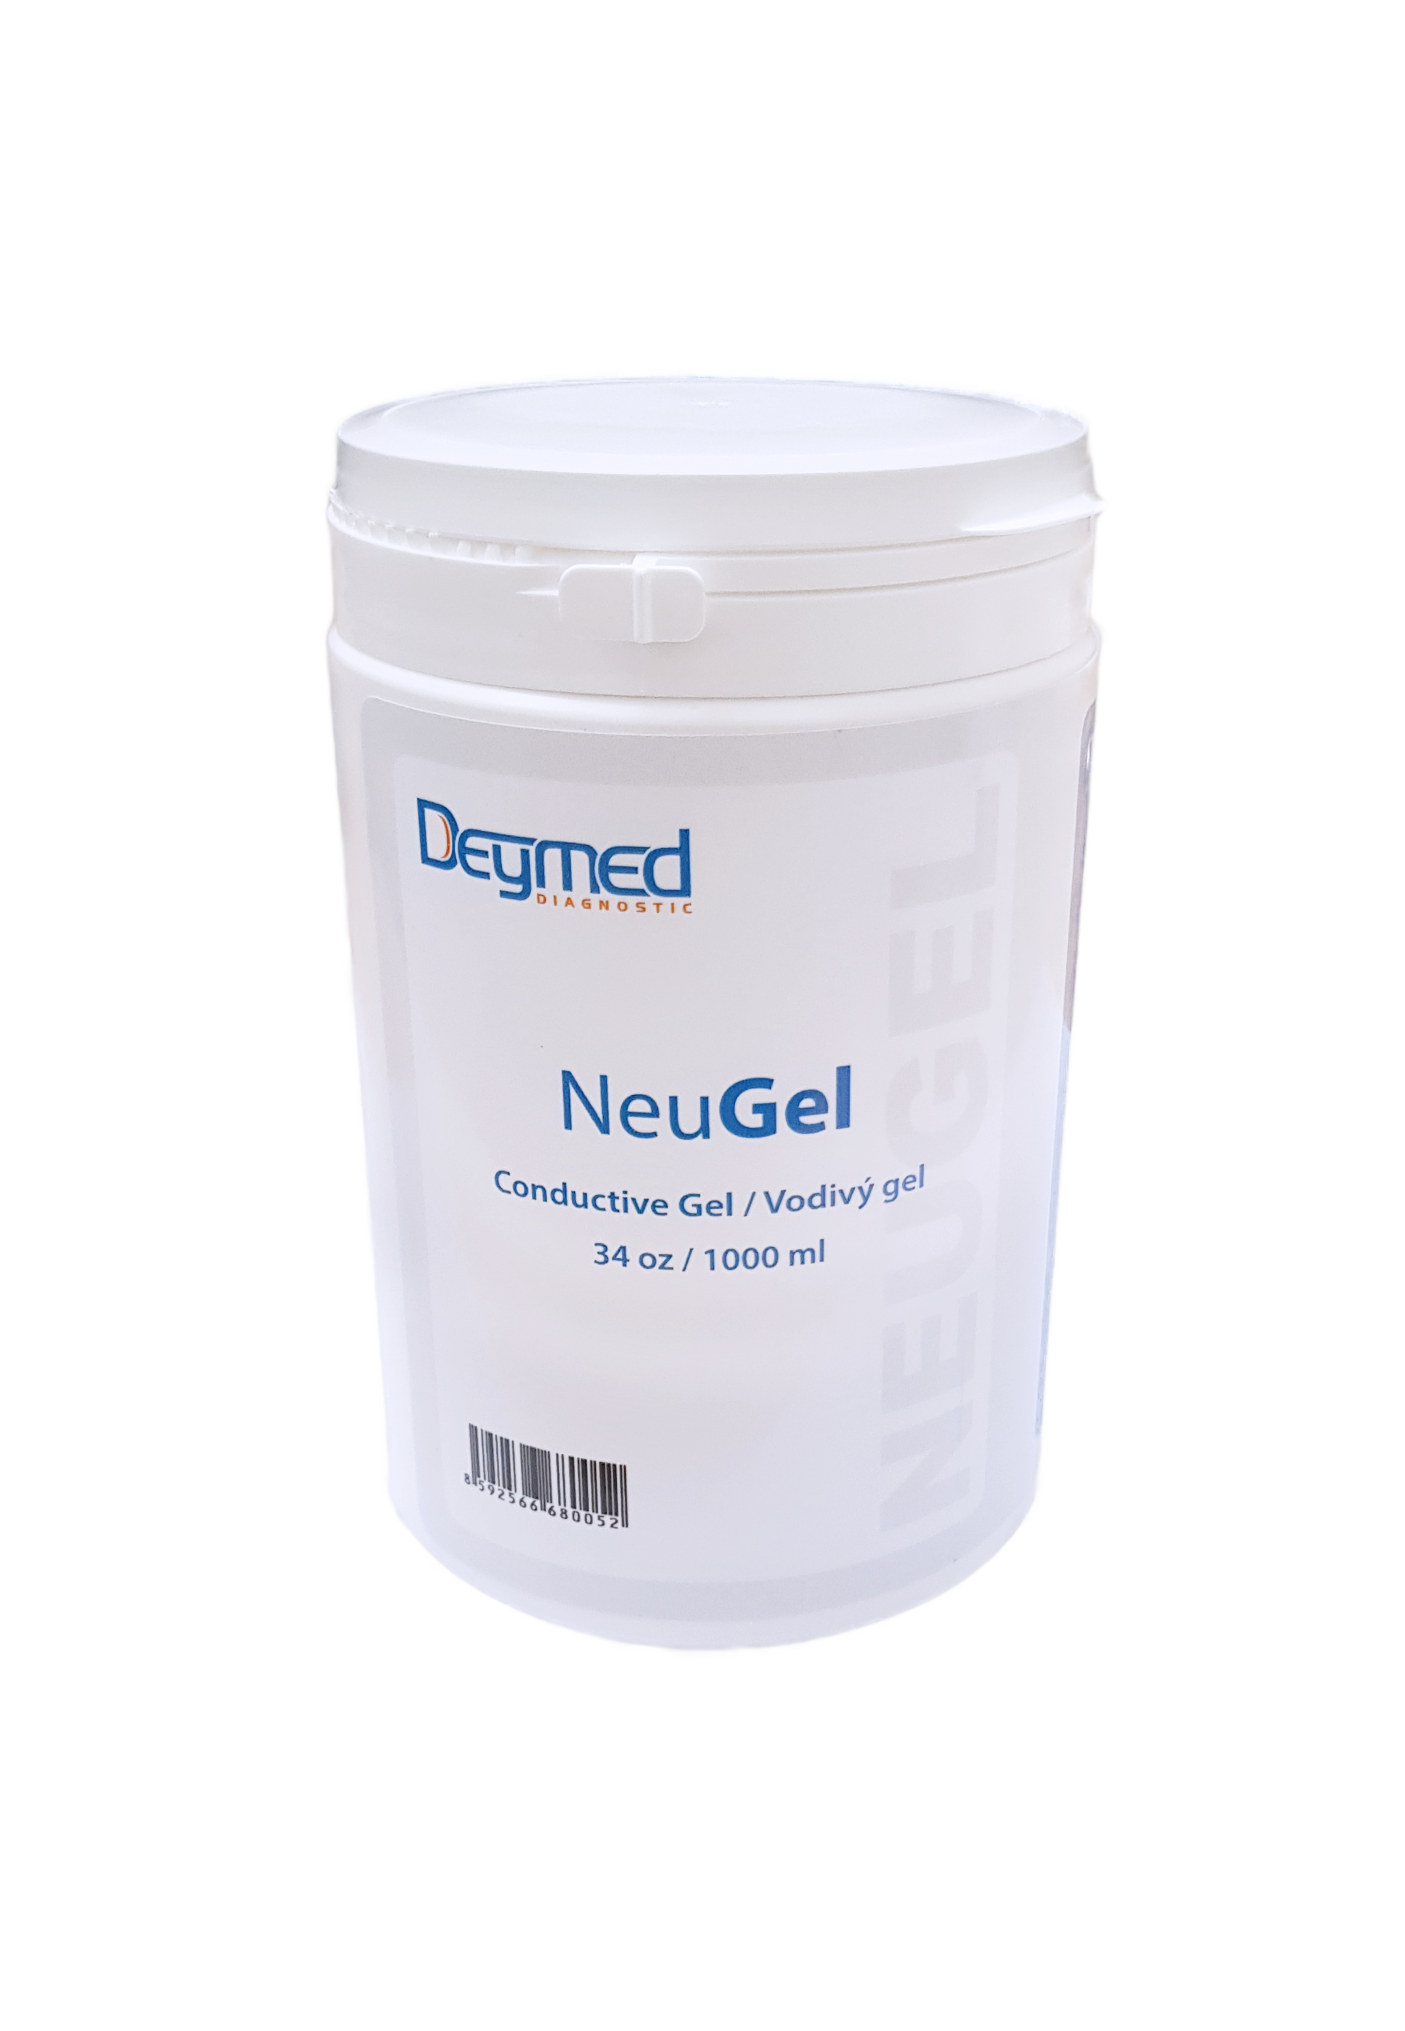 NeuGEL - EEG elektrovodivý gel Deymed: 1000ml (34 oz)